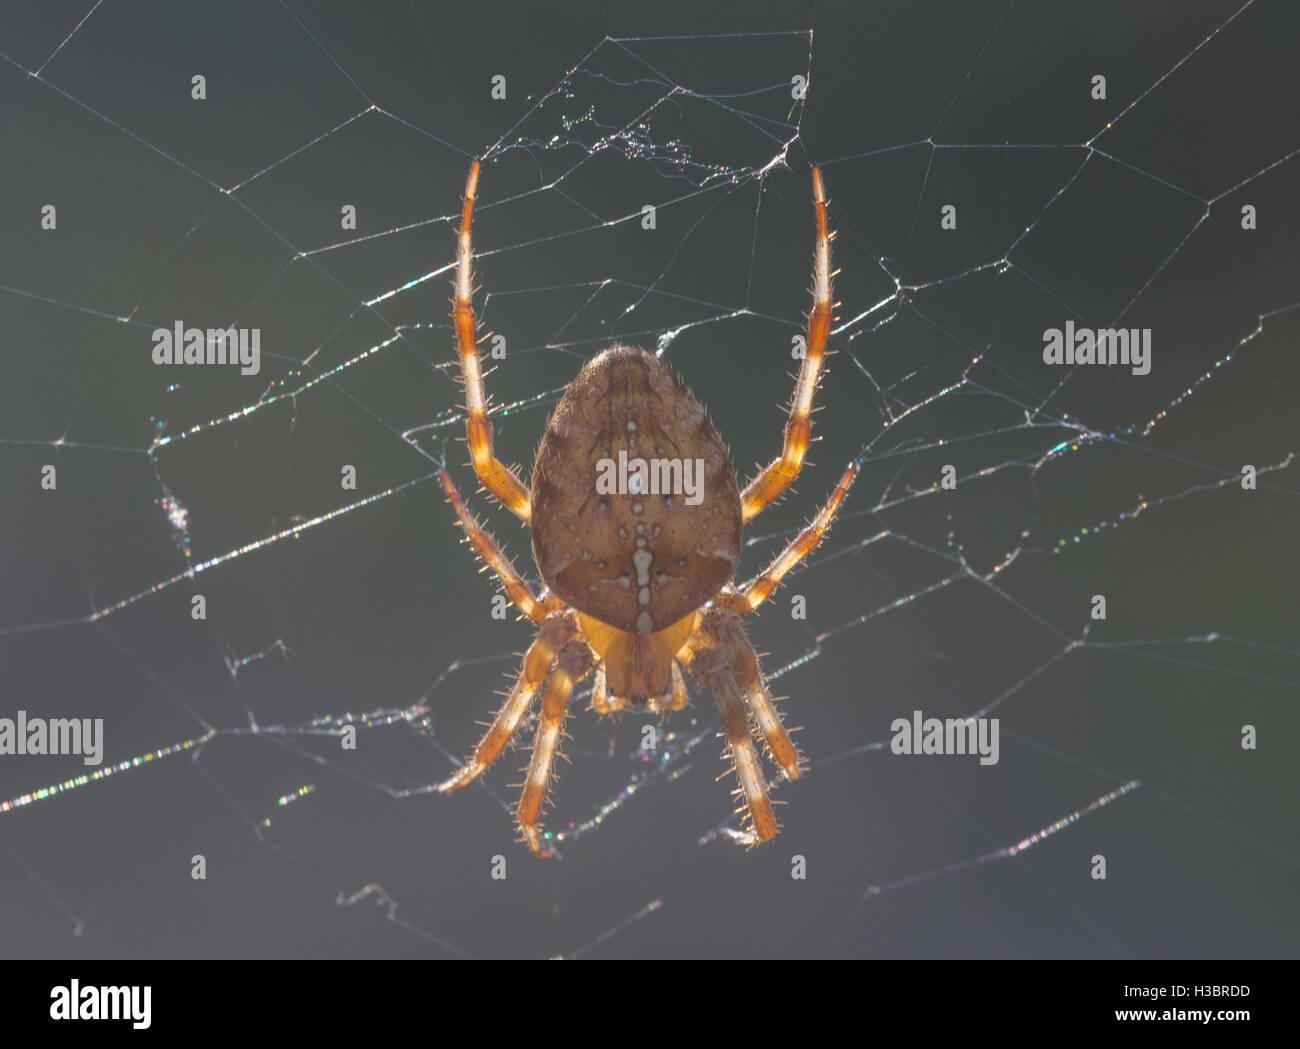 Garden spider, garden orb-weaver or cross spider (Araneus diadematus) in Surrey, England - Stock Image